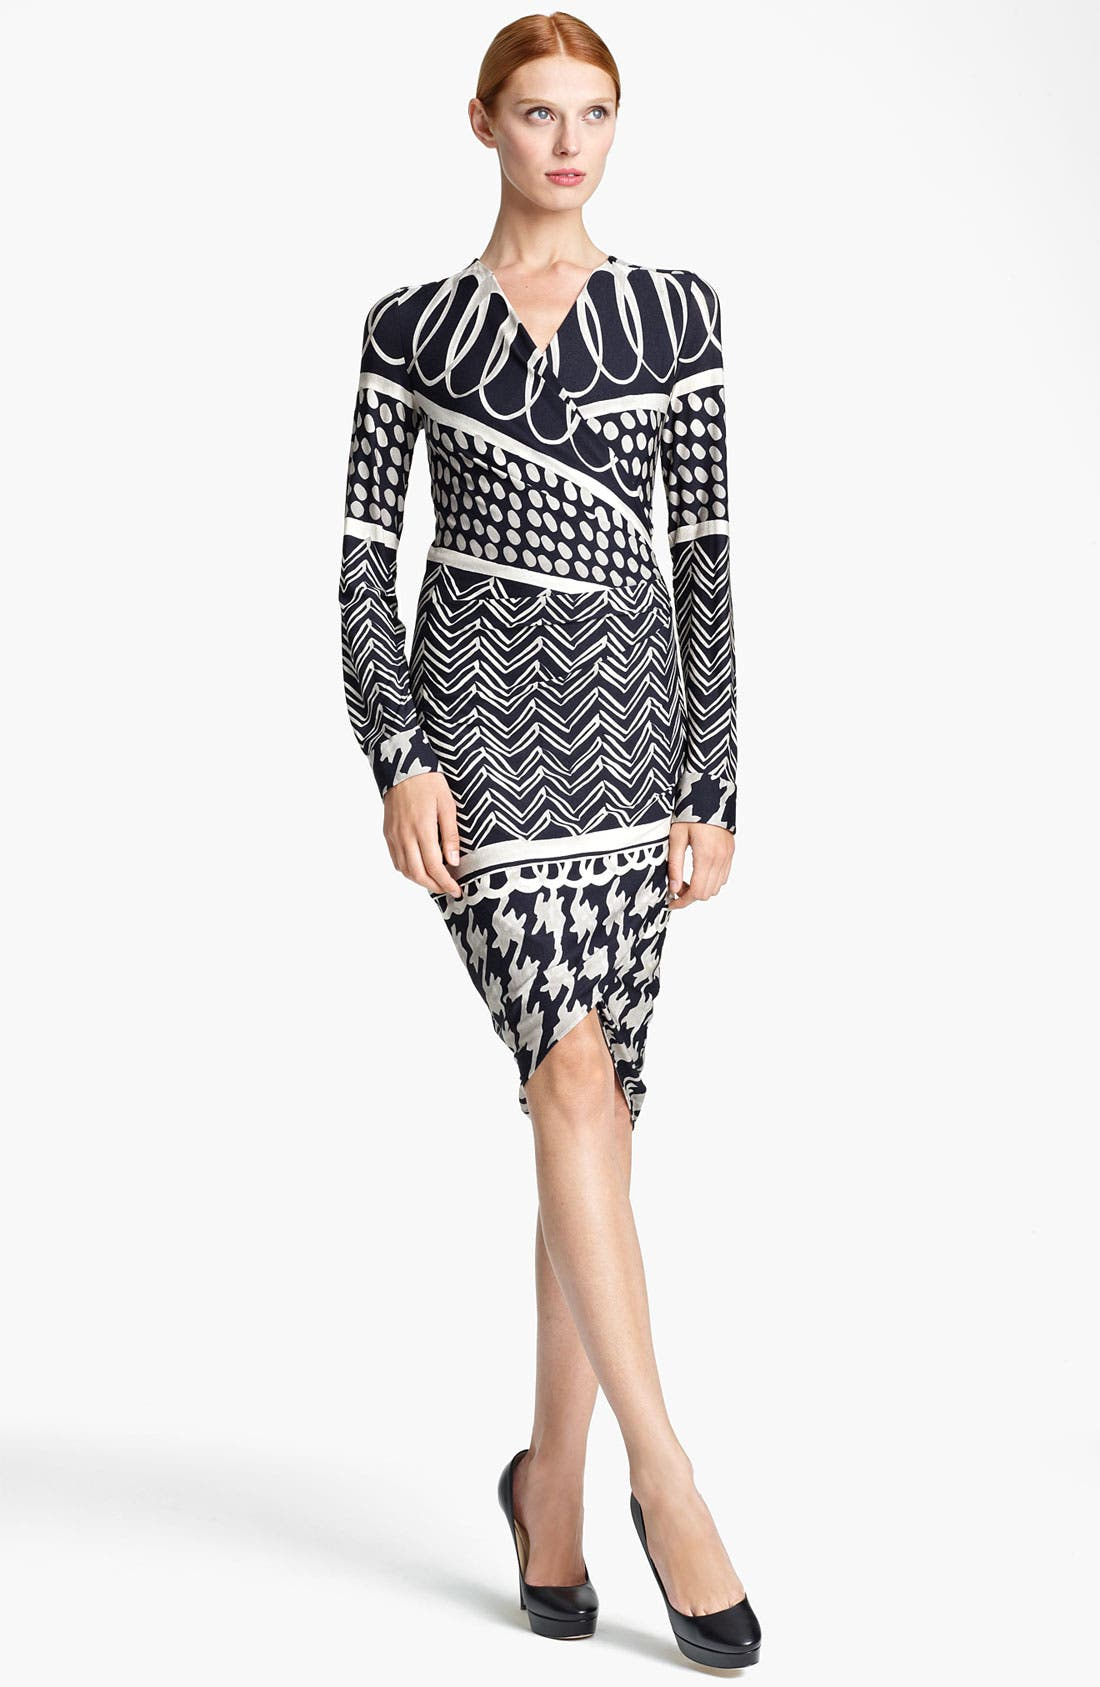 Alternate Image 1 Selected - Max Mara 'Eneide' Print Jersey Dress